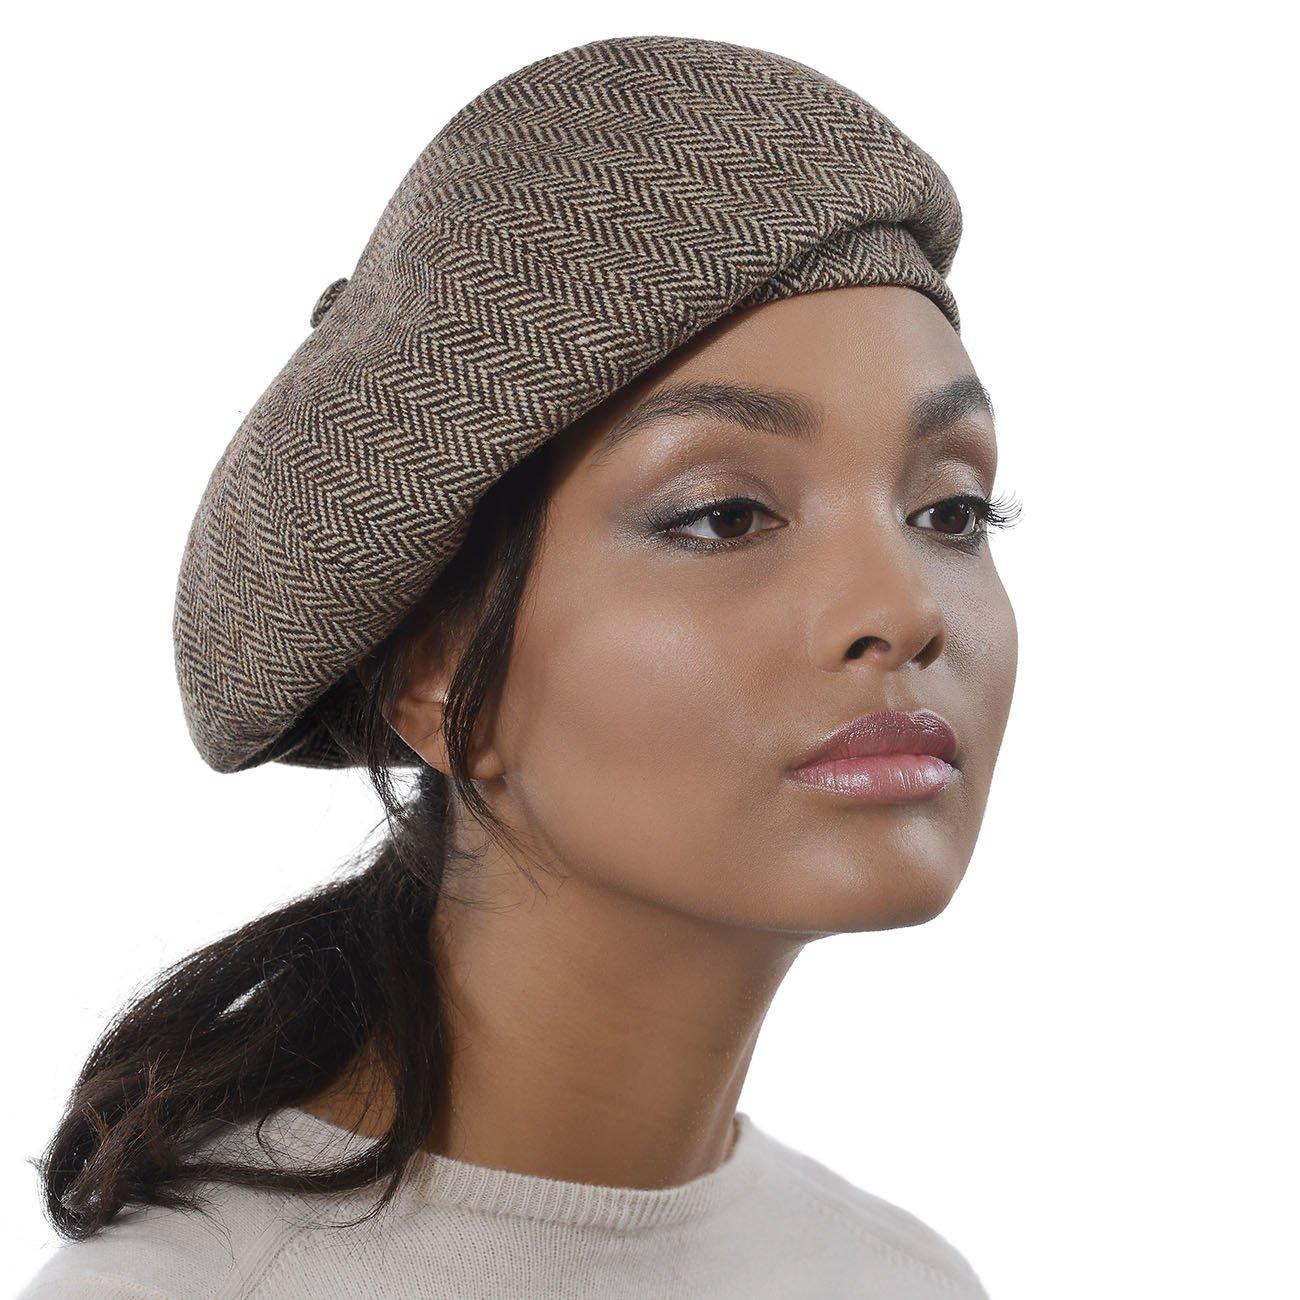 Eric Javits Designer Women's Luxury Headwear - Tweed Beret - Brown Mix